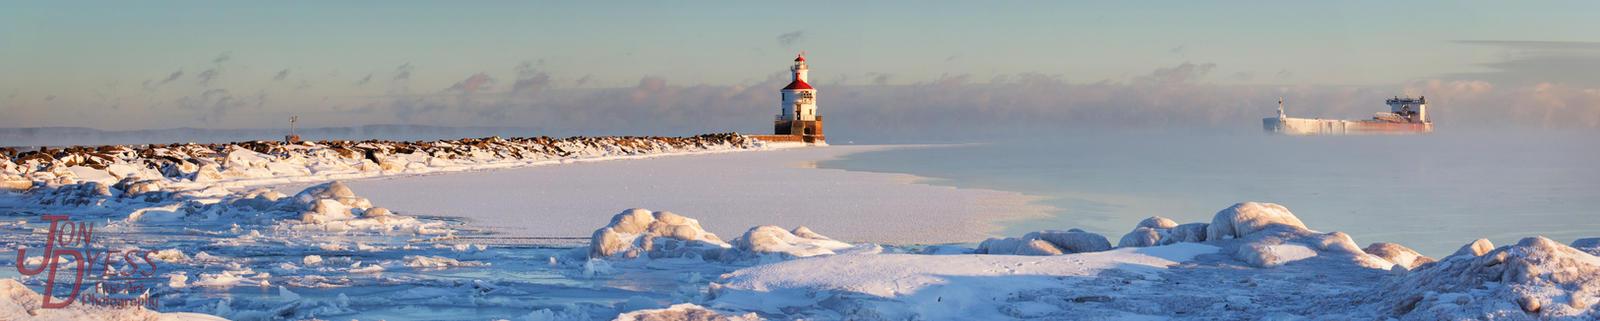 Frozen Beacon by hull612